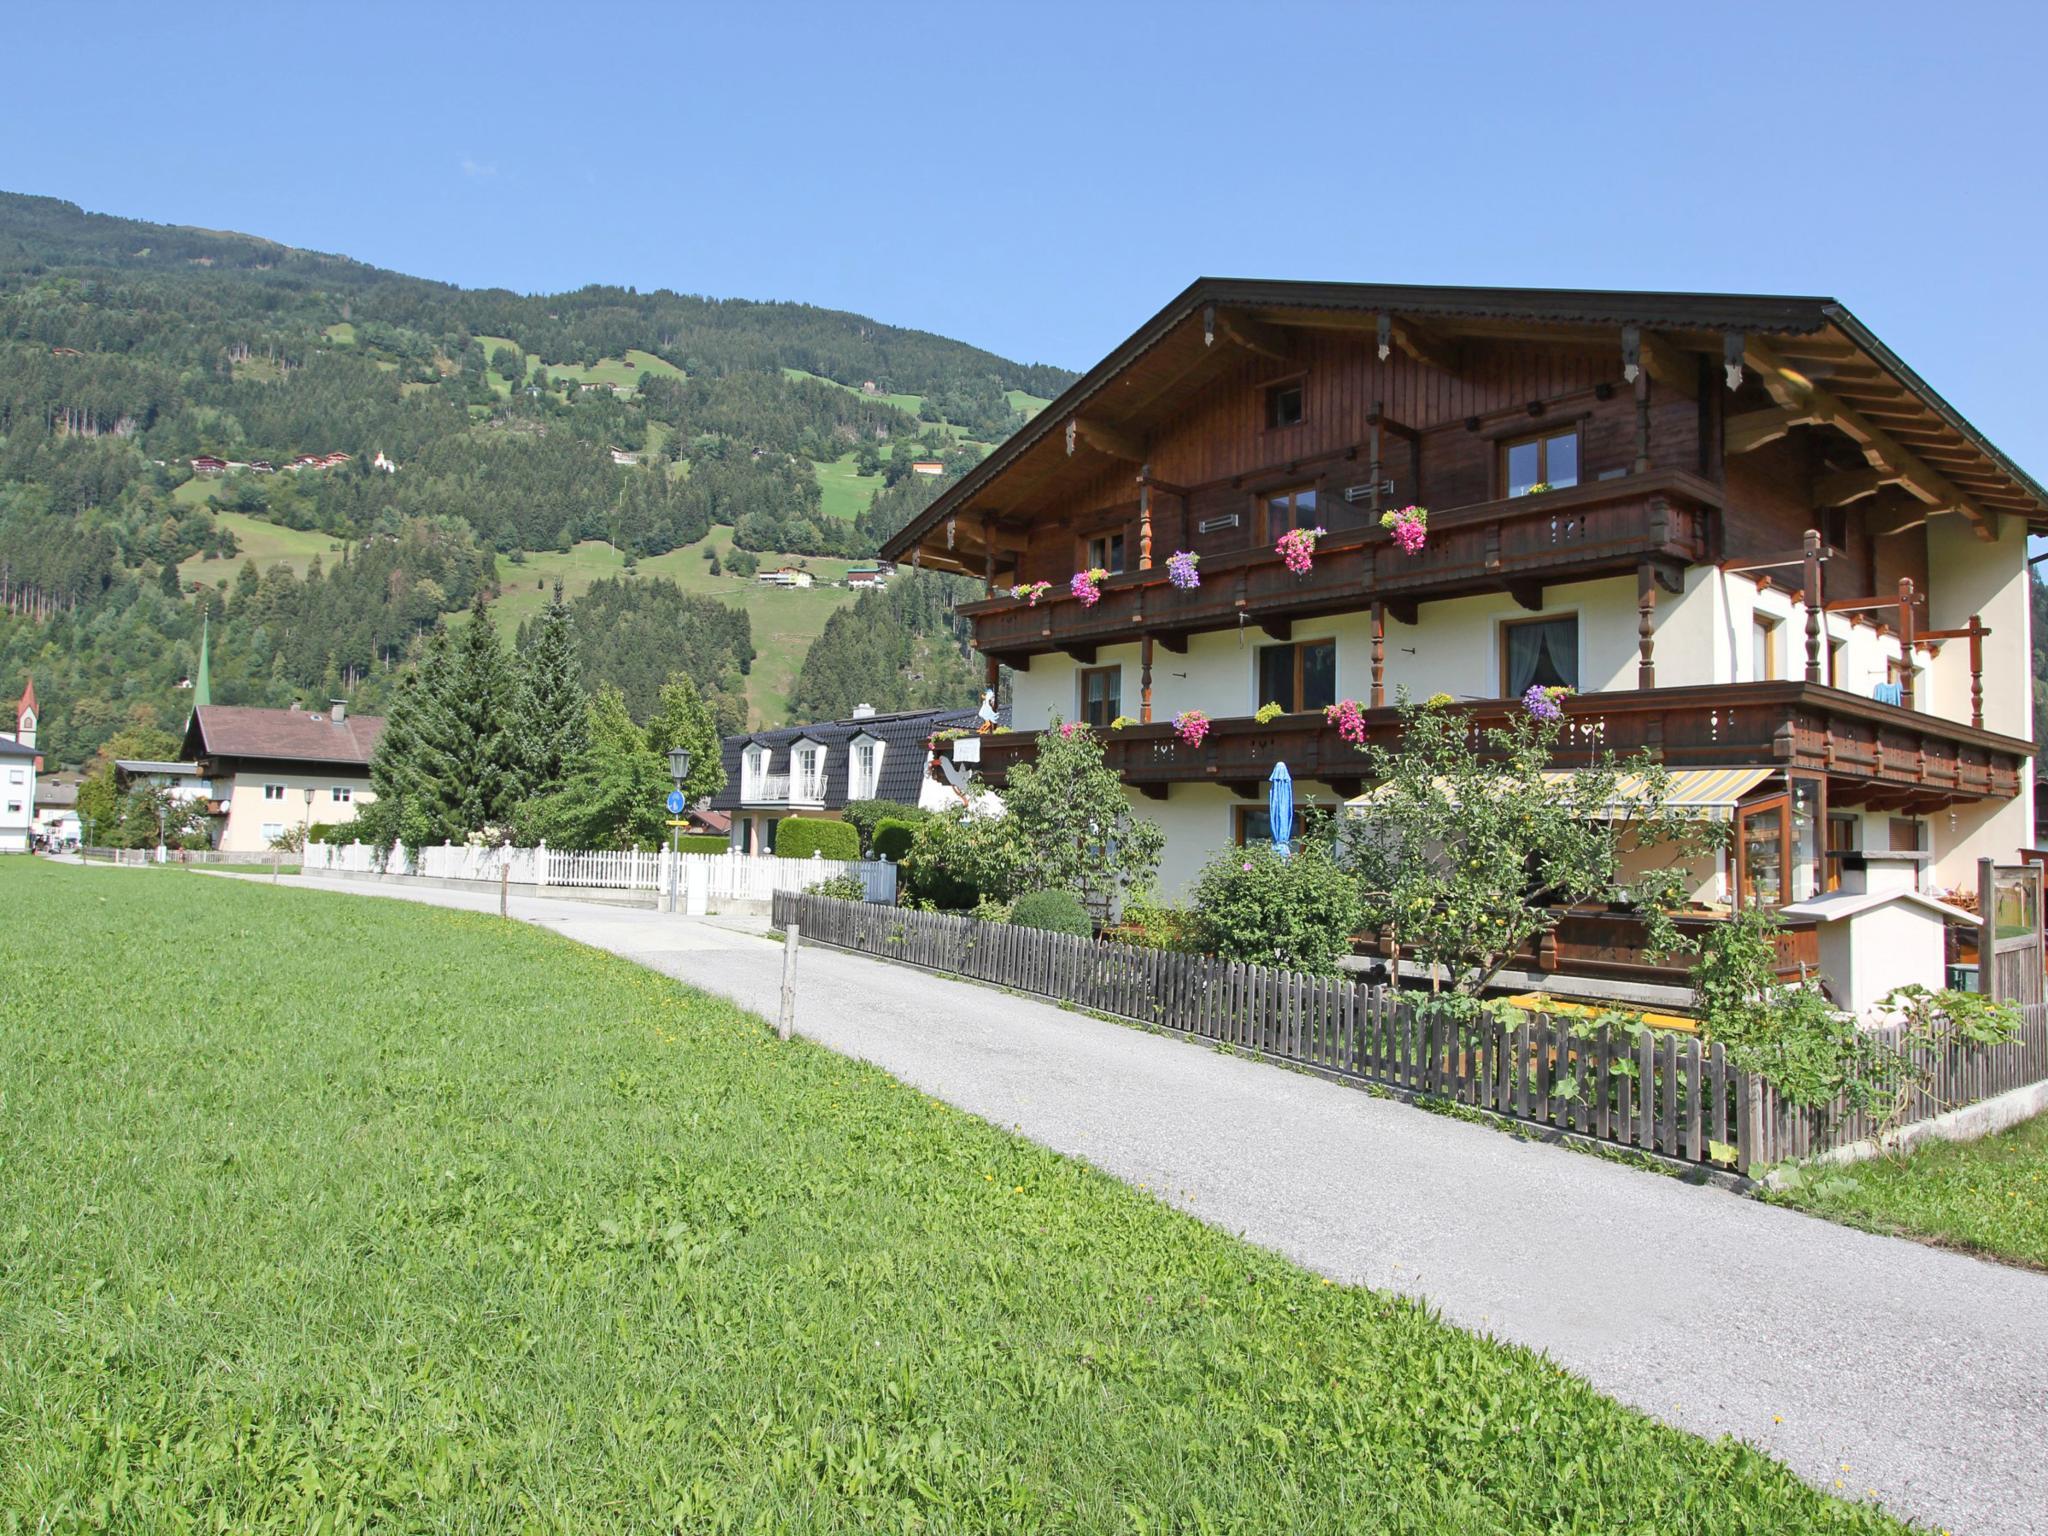 Fankhauser Tirol